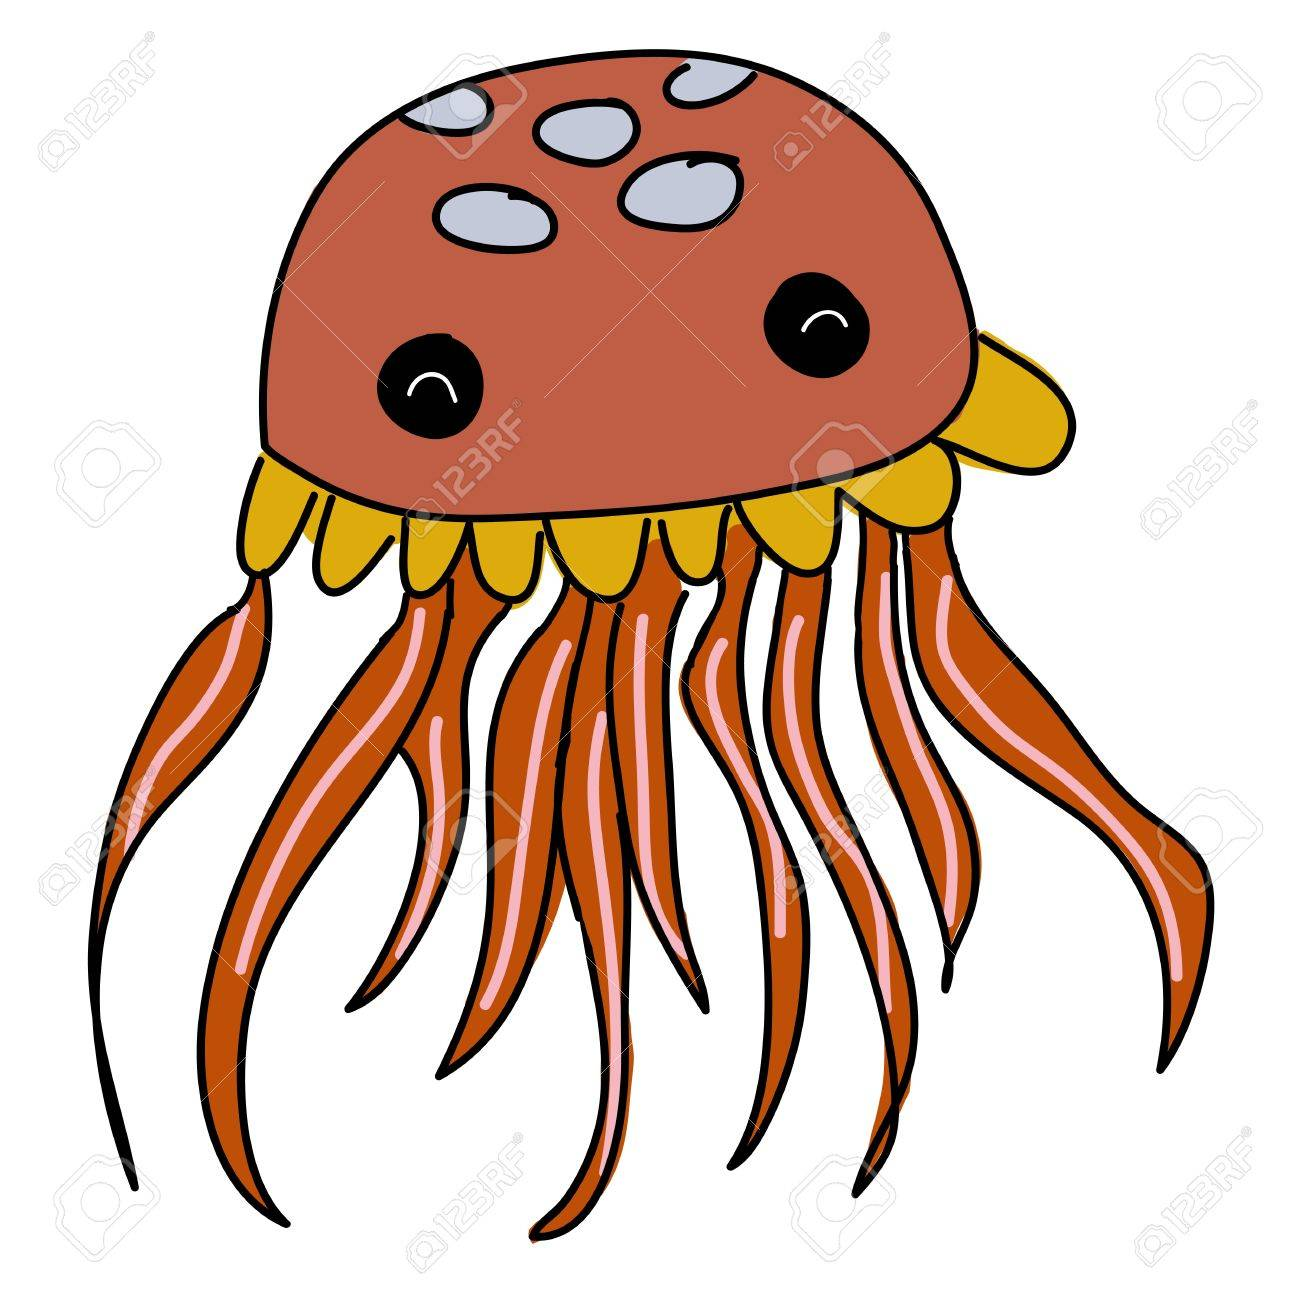 cute jellyfish cartoon Stock Photo - 16388232